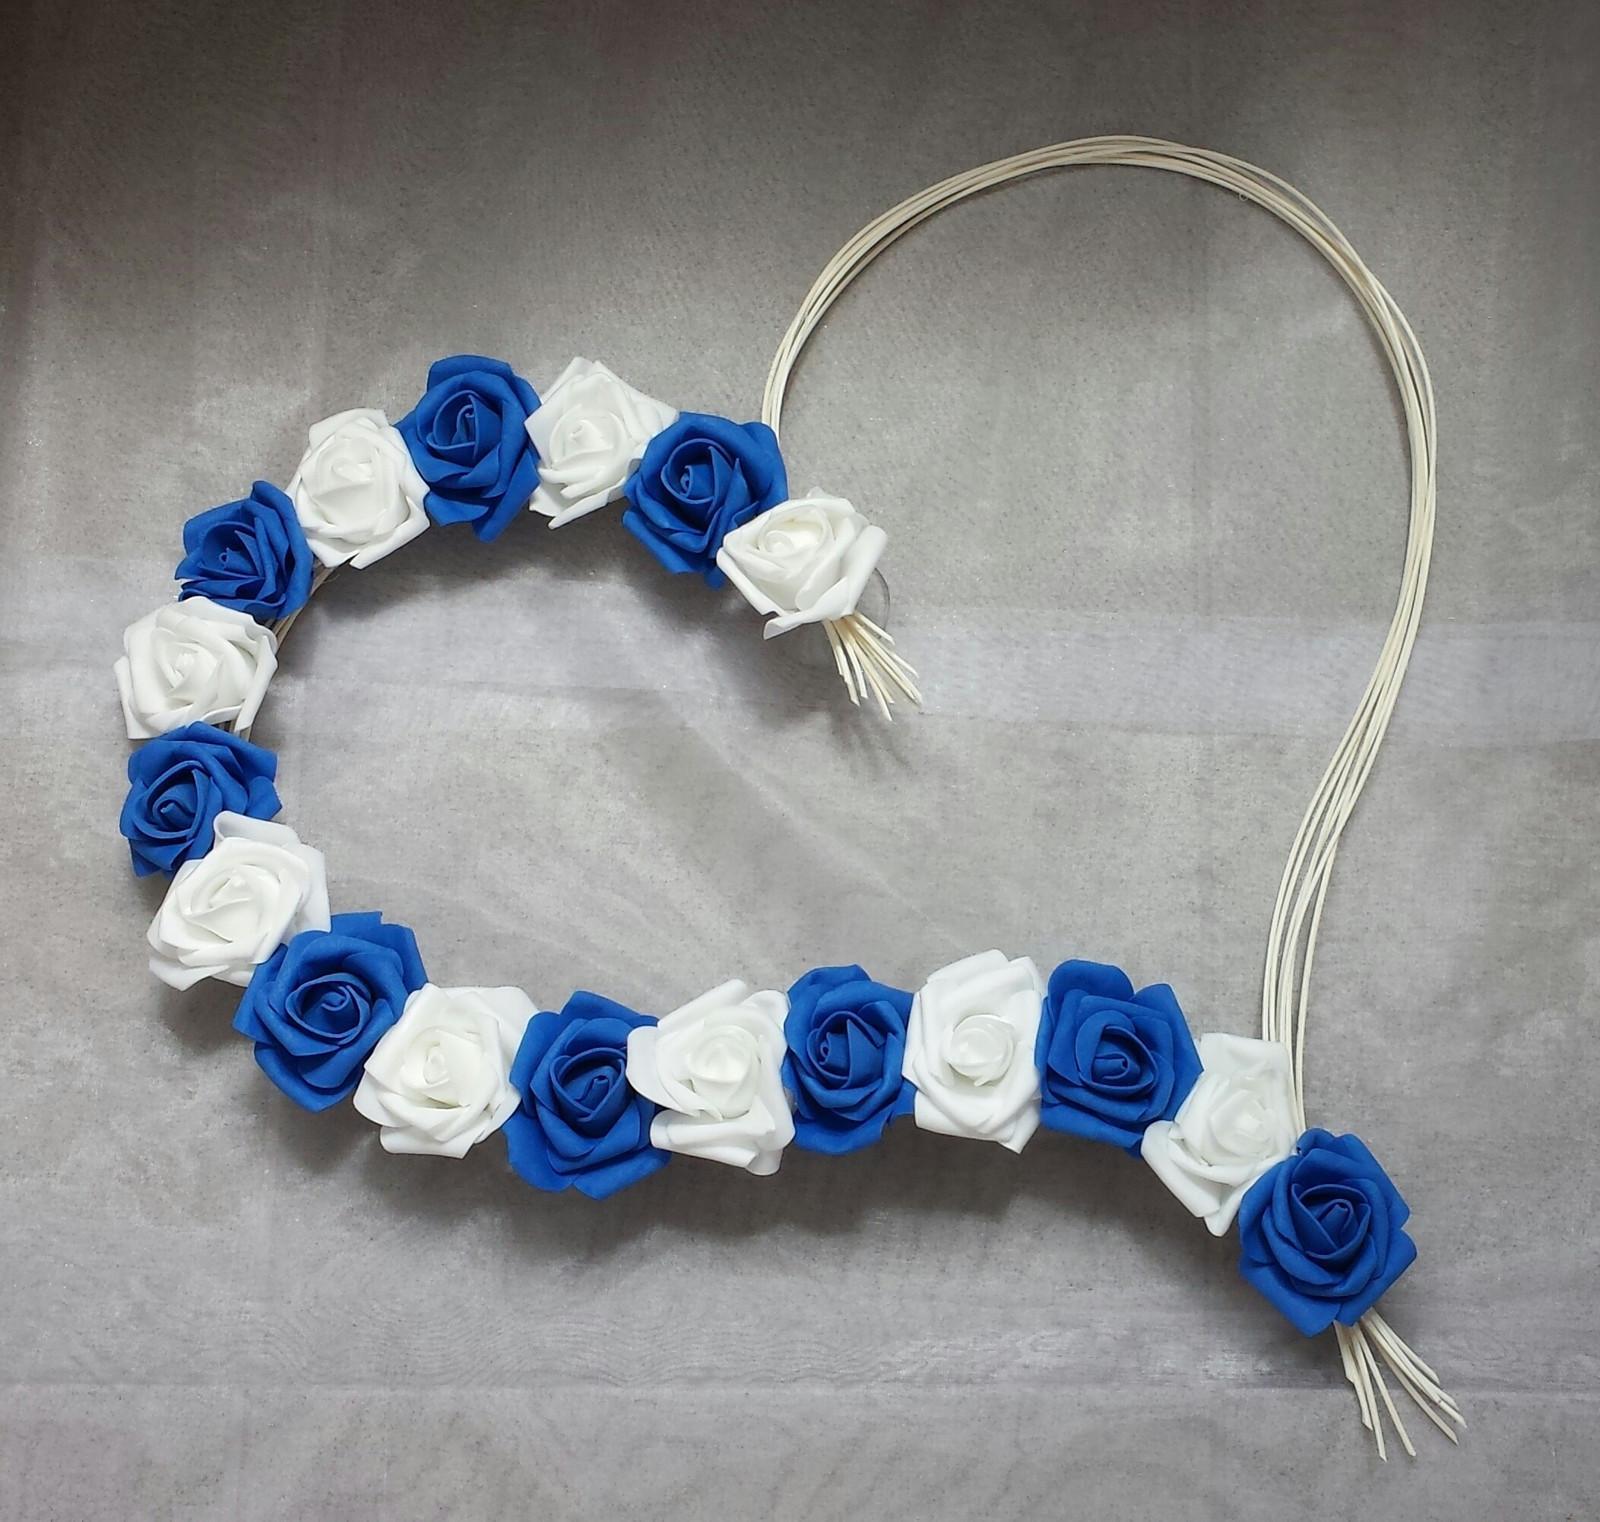 Pedigove srdce na kapotu modrá a bílá - Obrázek č. 1